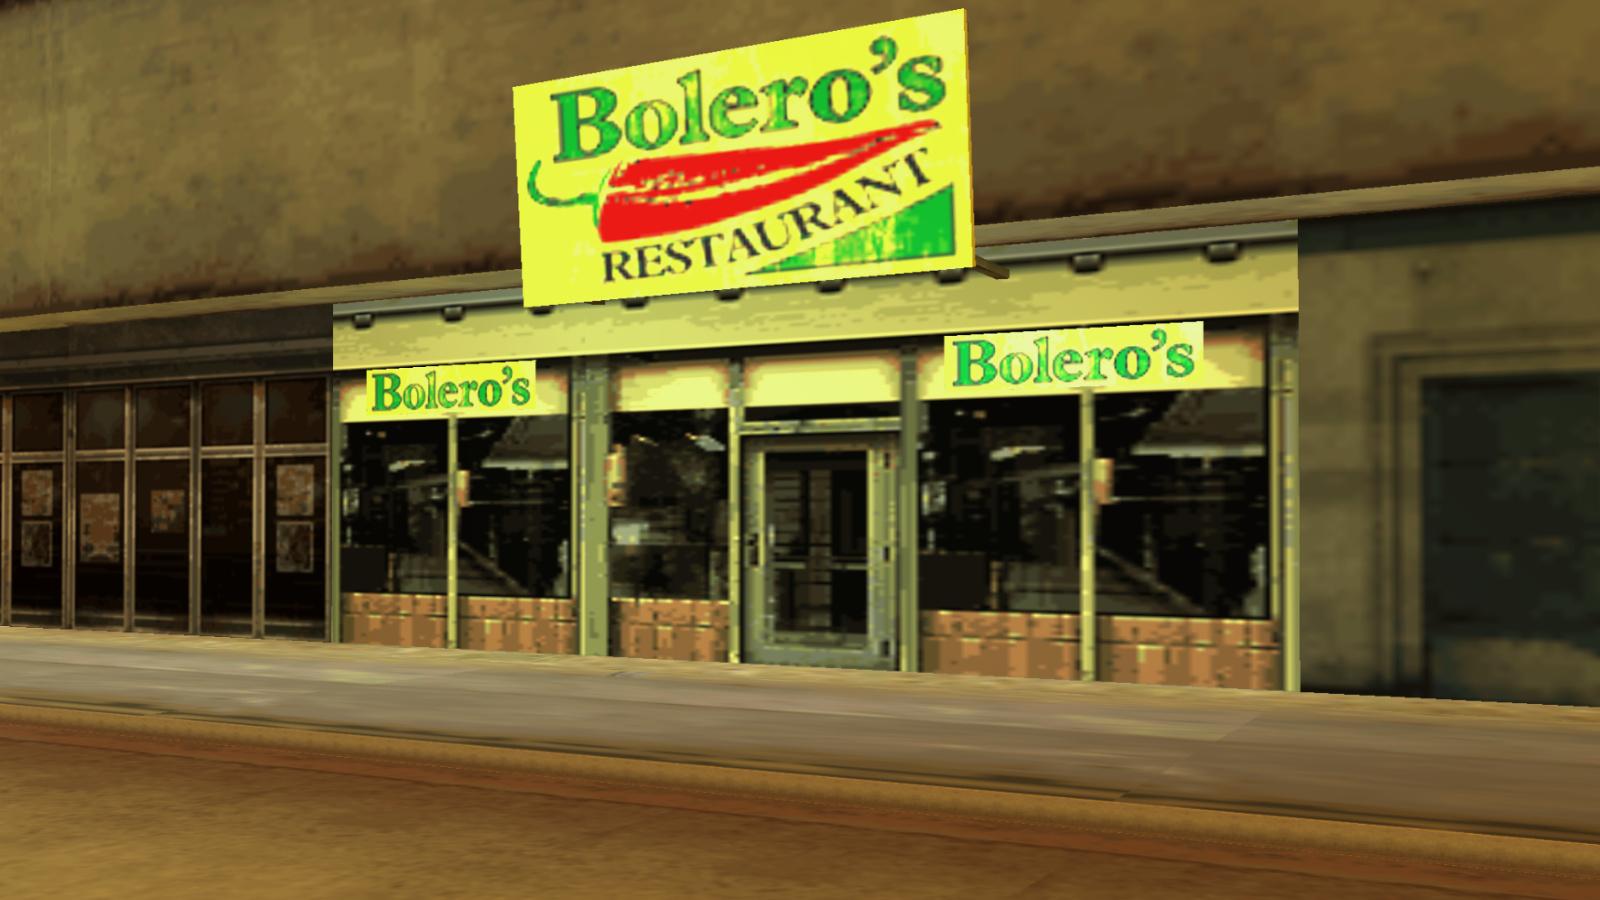 Bolero's Restaurant